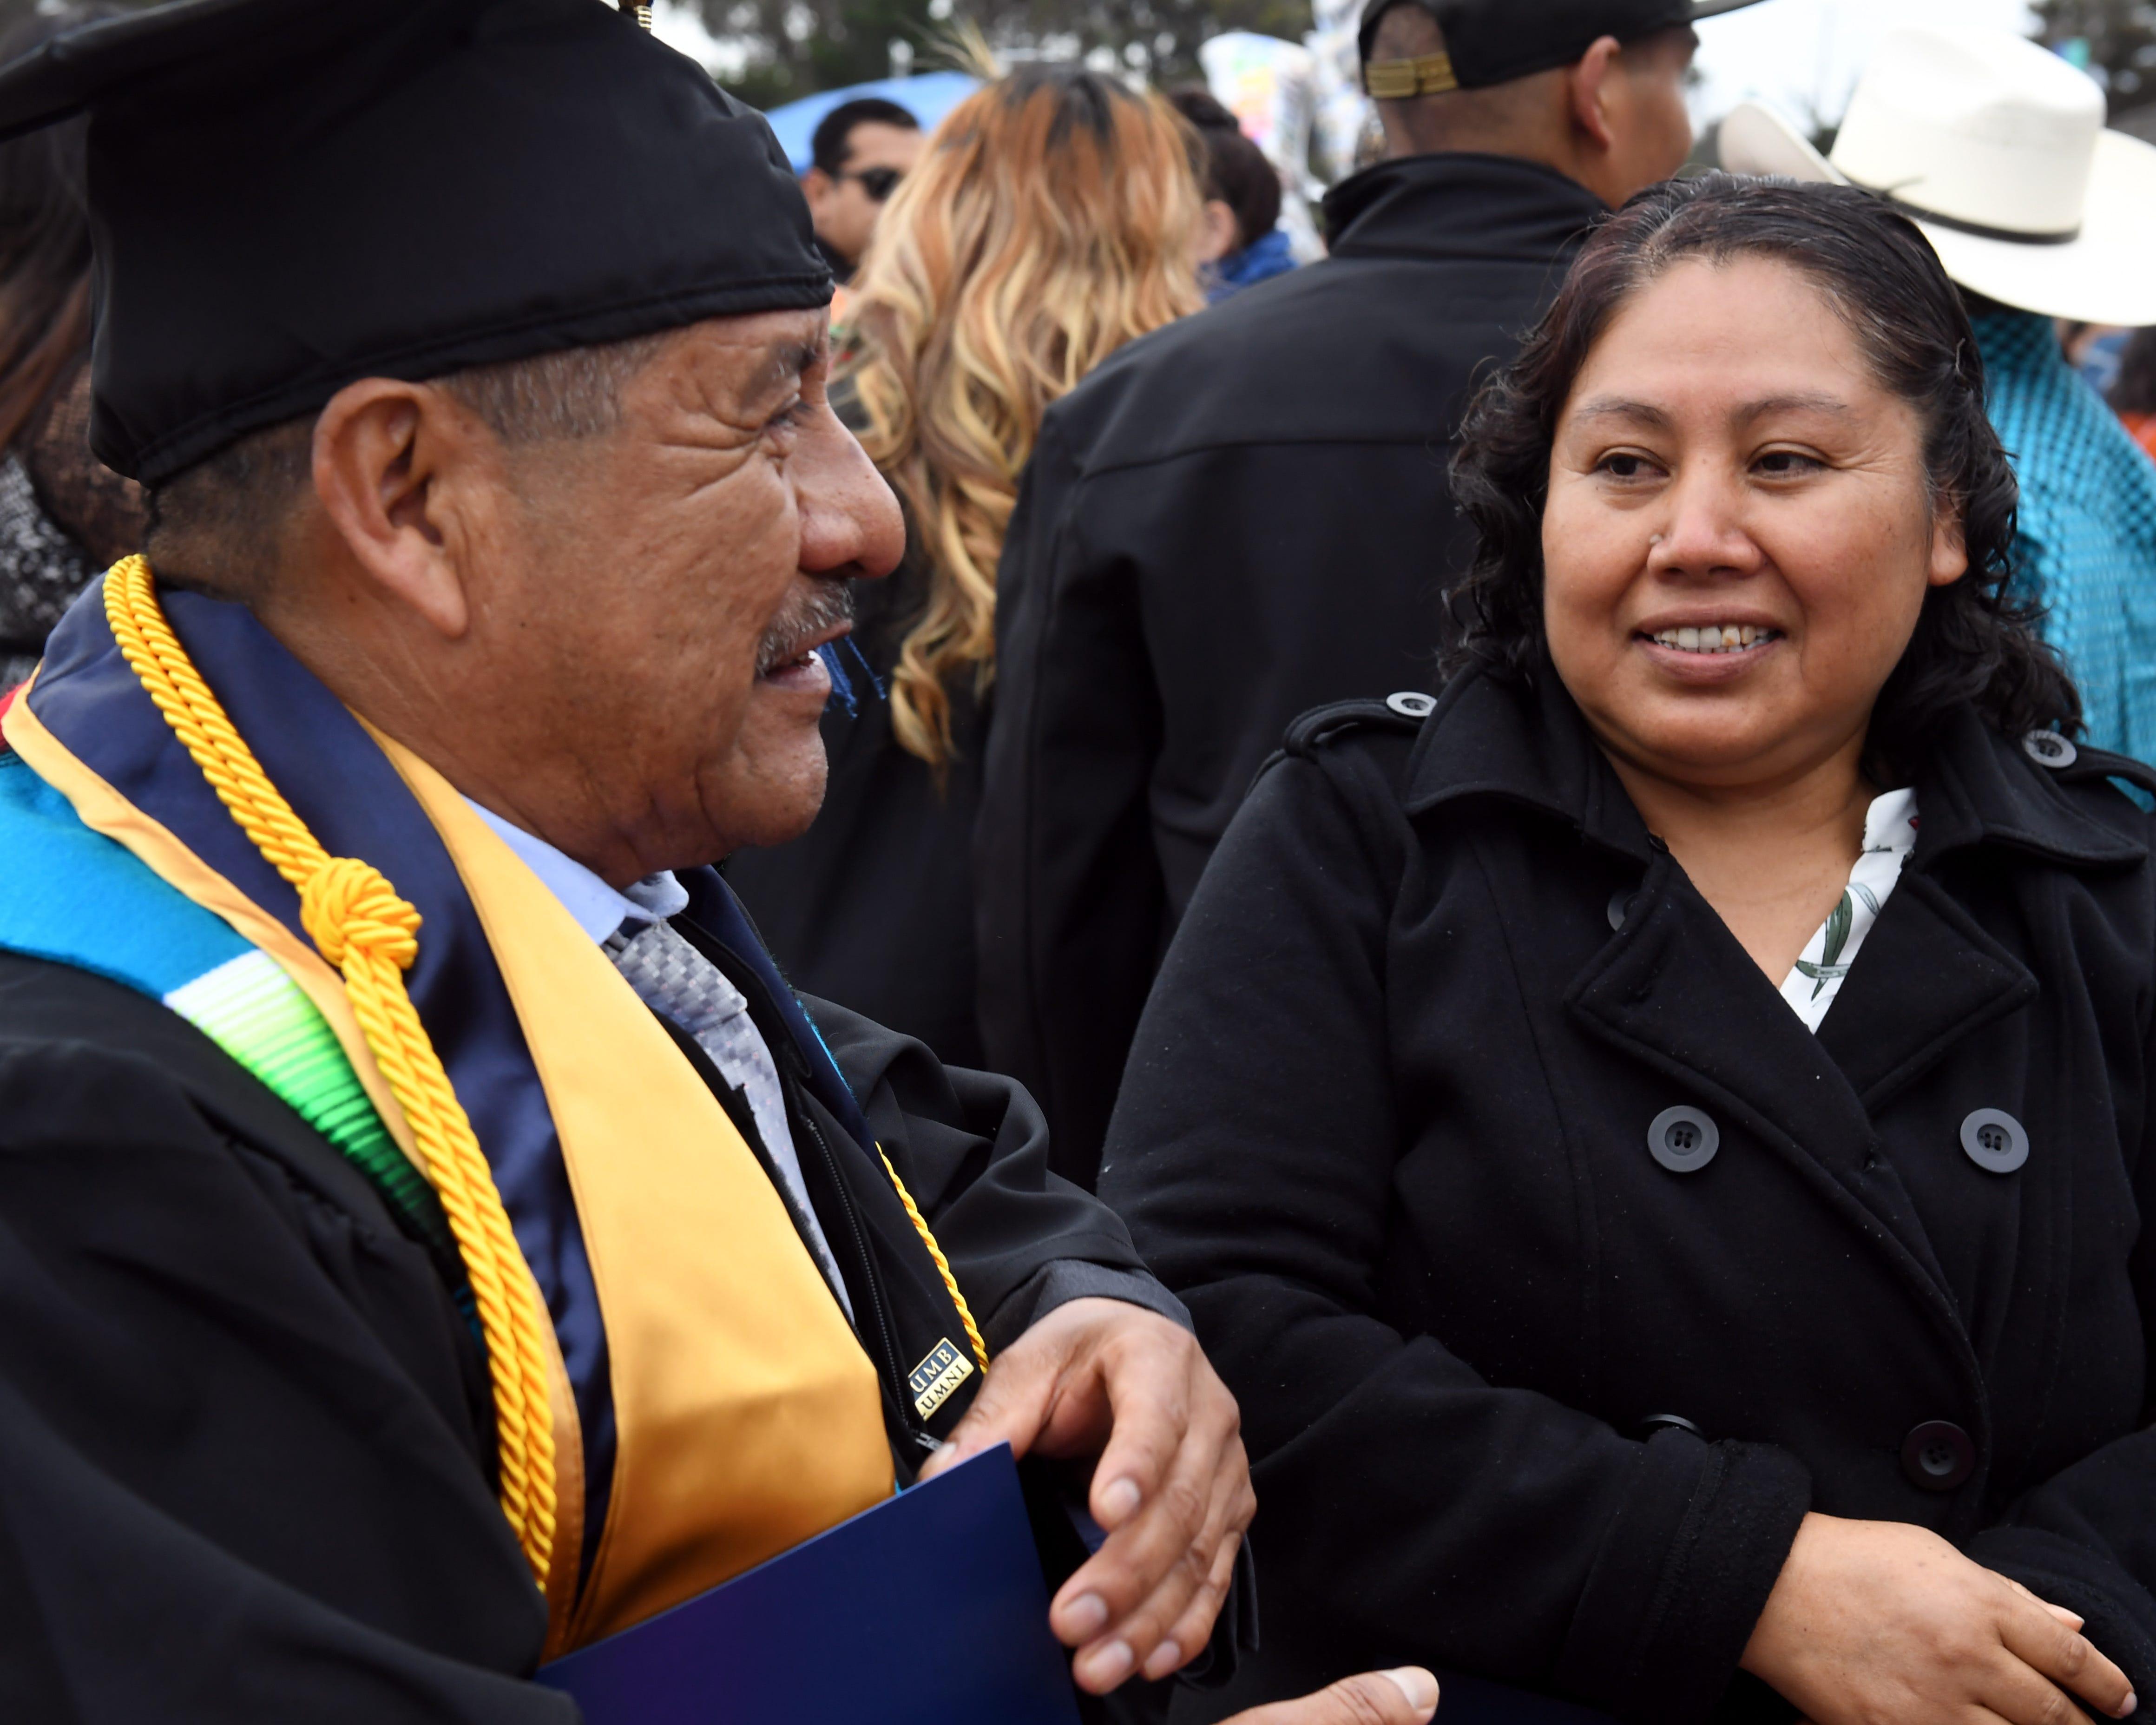 Maria Ibarra González congratulates her husband, Adolfo González, on earning his degree on May 18, 2019.